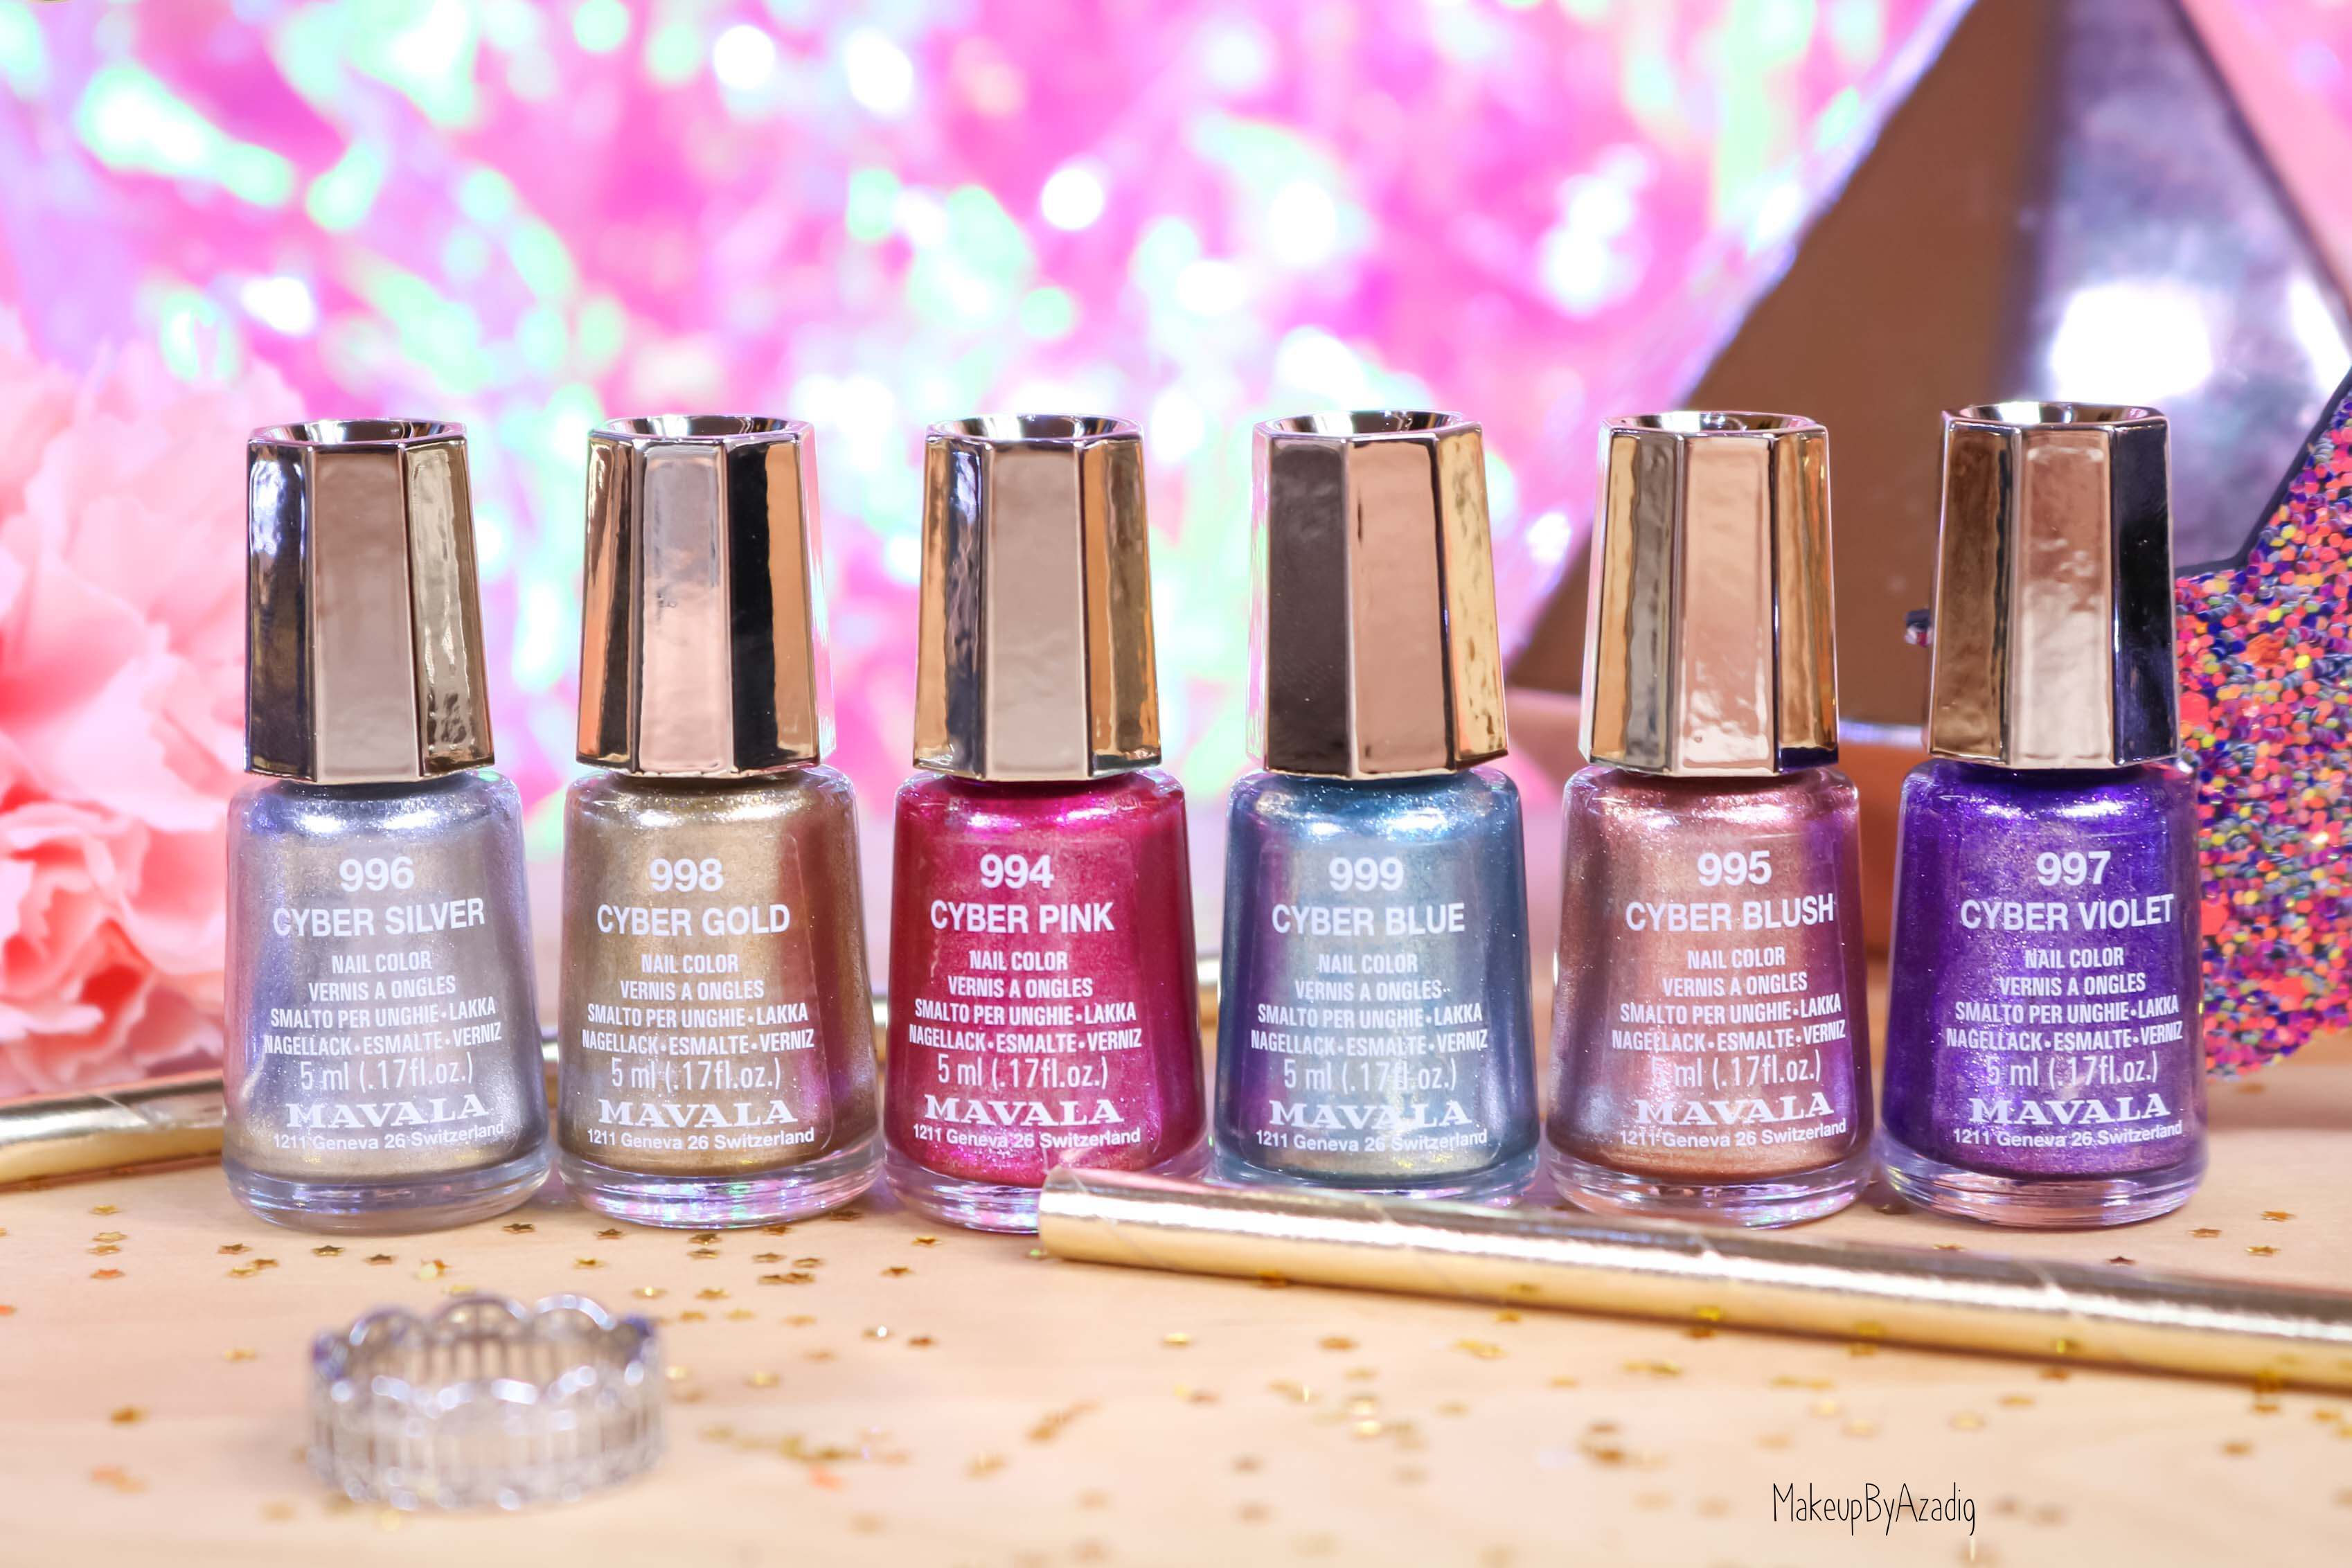 revue-collection-vernis-nails-cyber-chic-fetes-noel-metallique-gold-silver-makeupbyazadig-swatch-avis-prix-collector